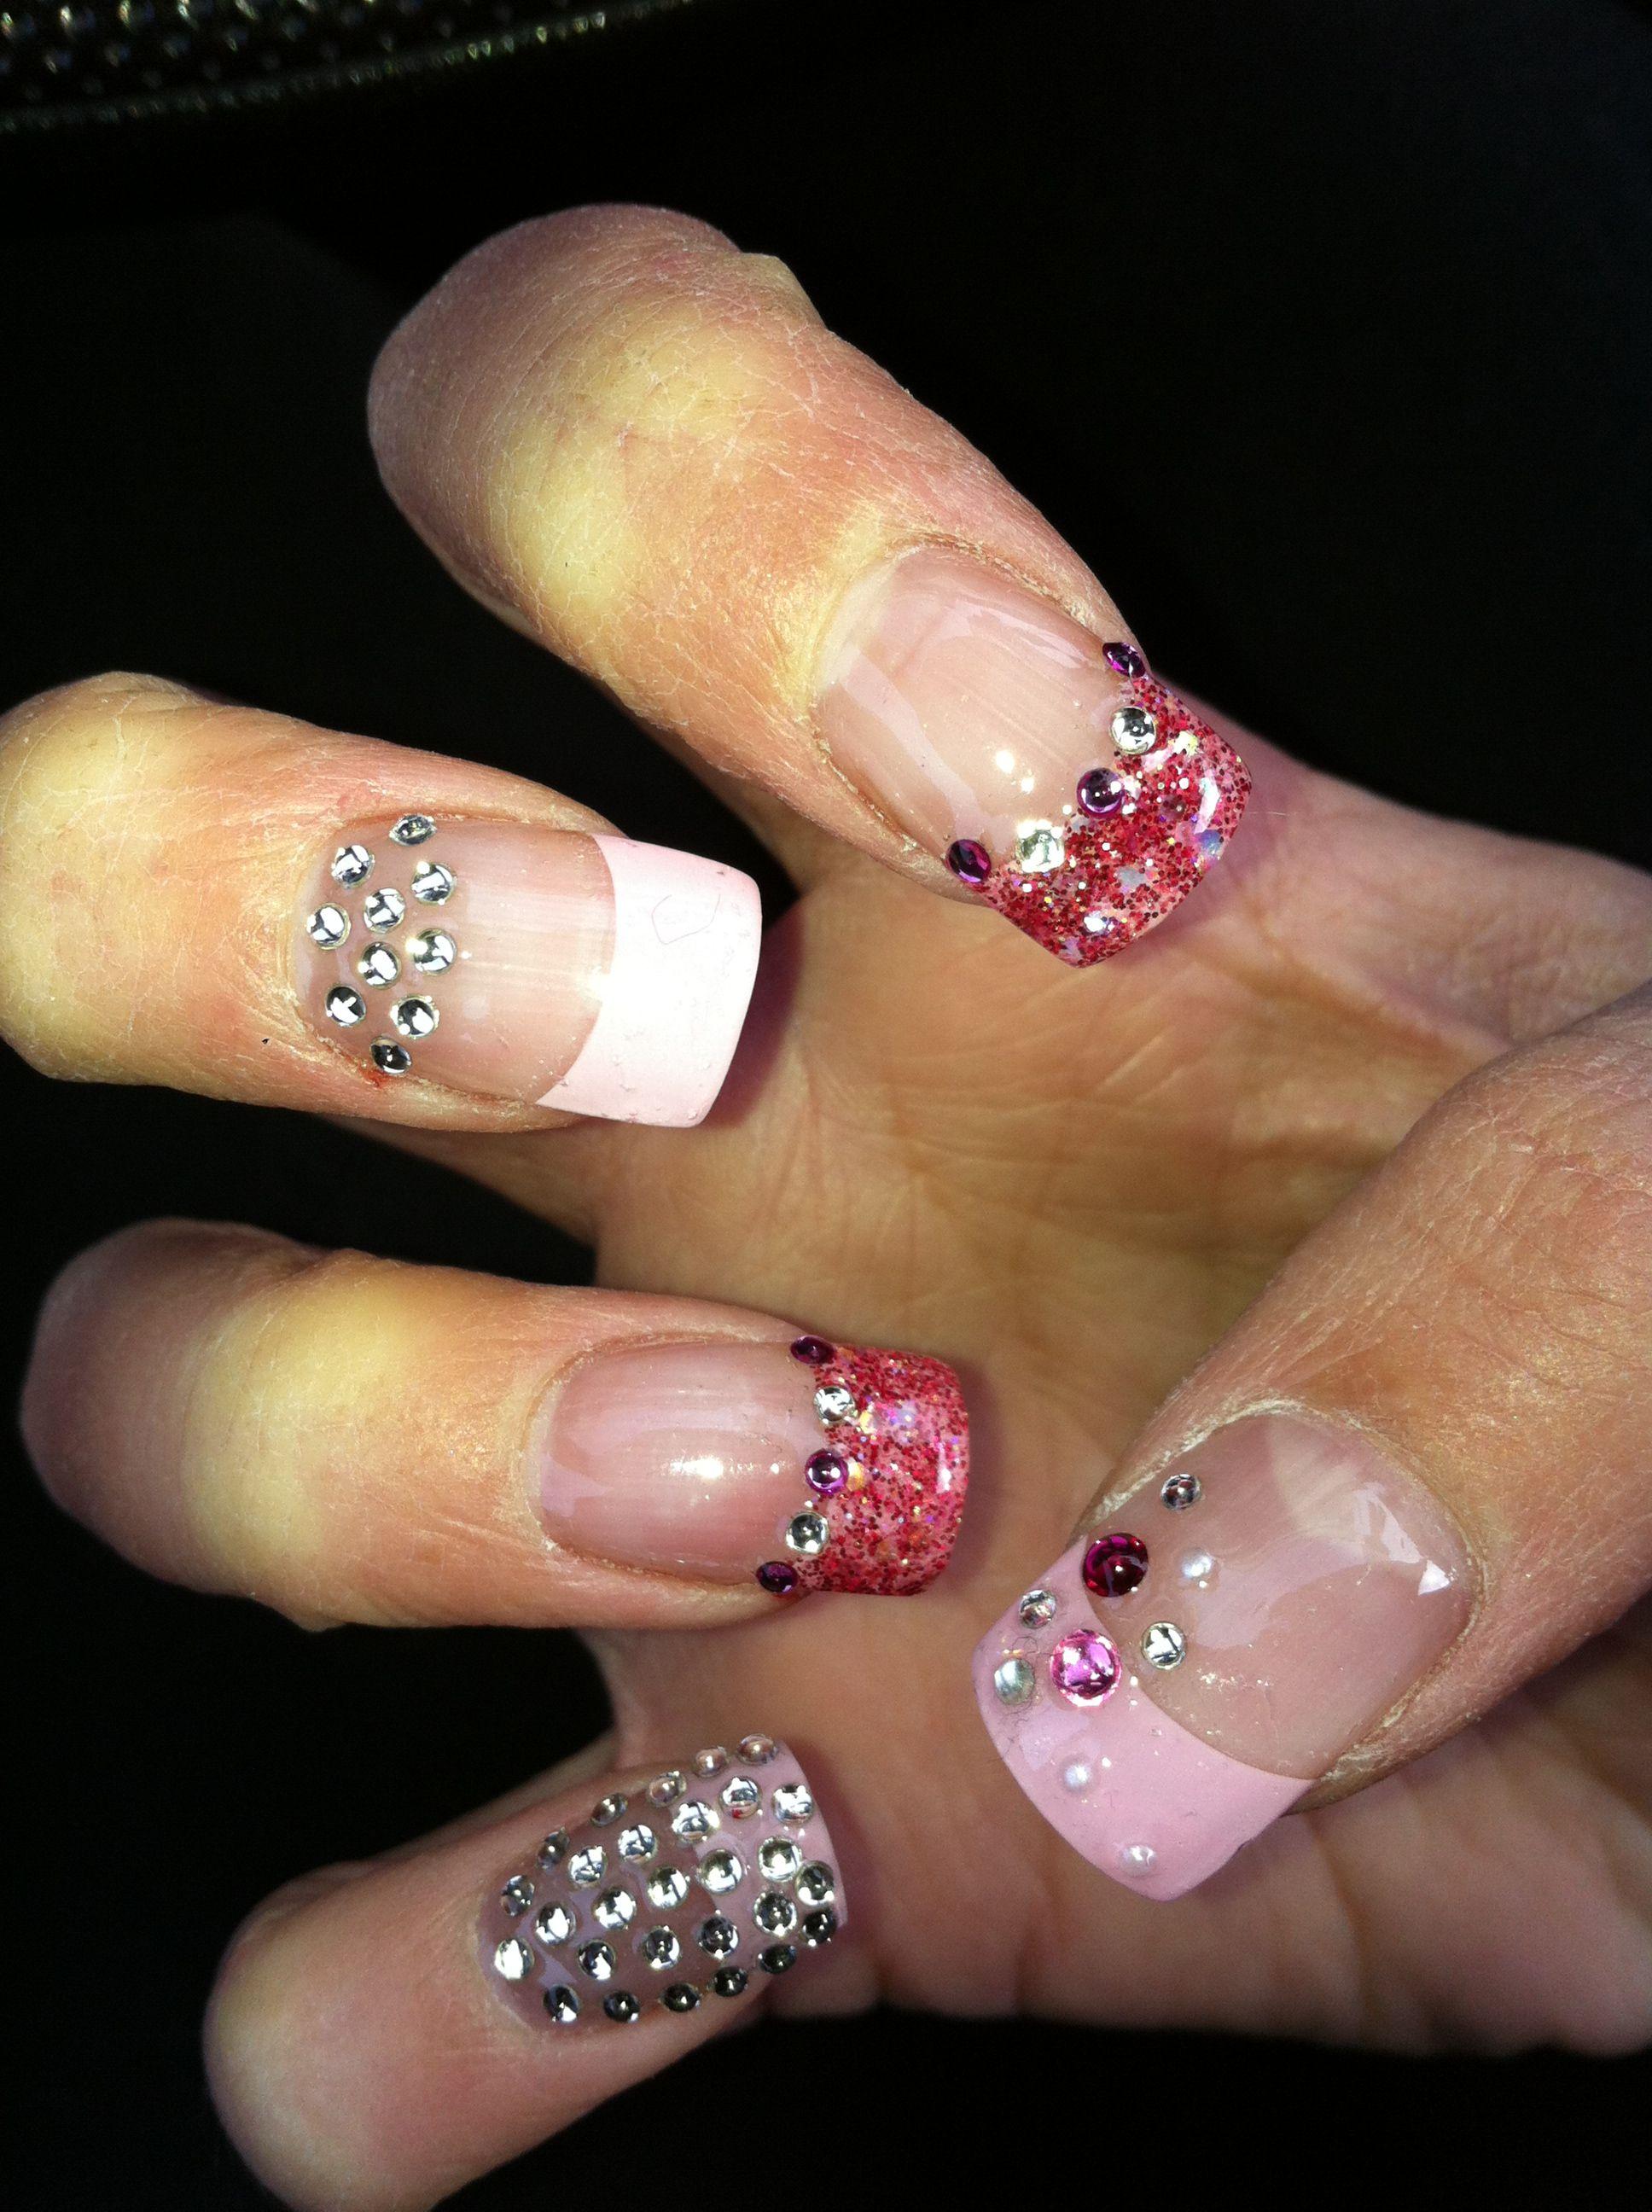 diamond nail | Nails | Pinterest | Diamond nails and Mani pedi